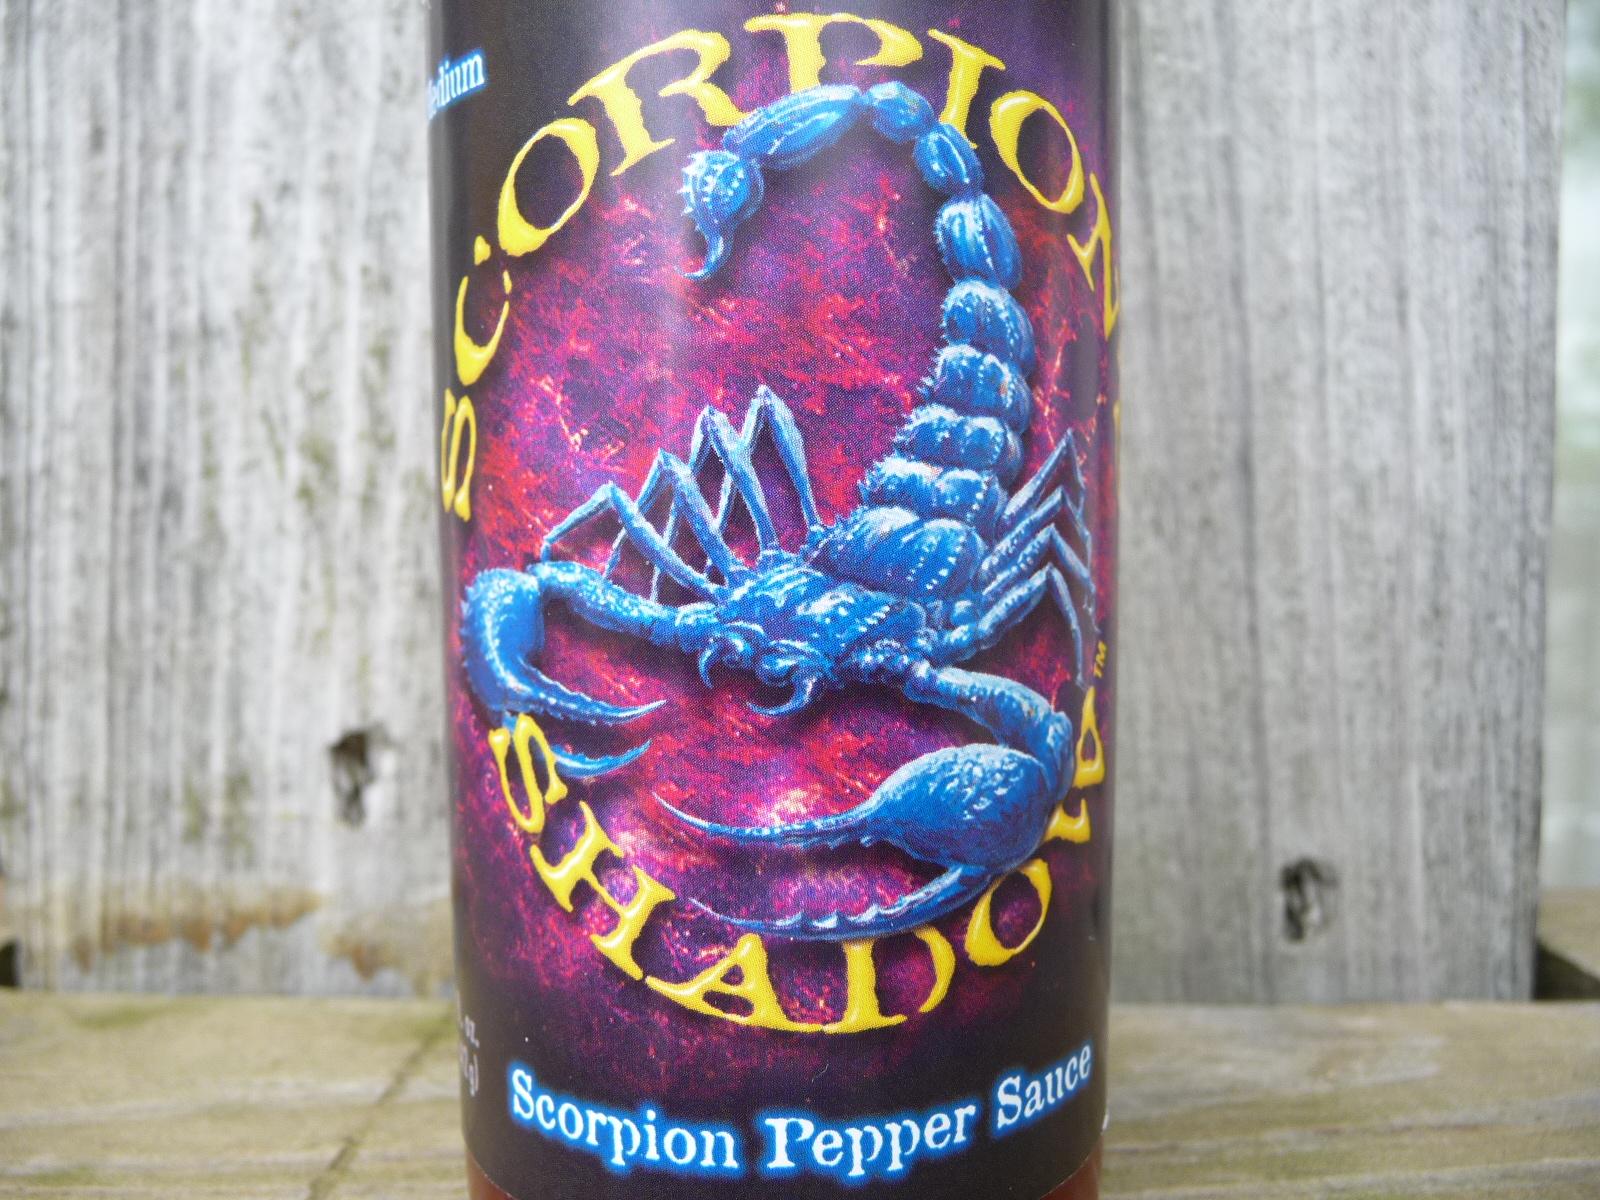 scorpions-shadow-label